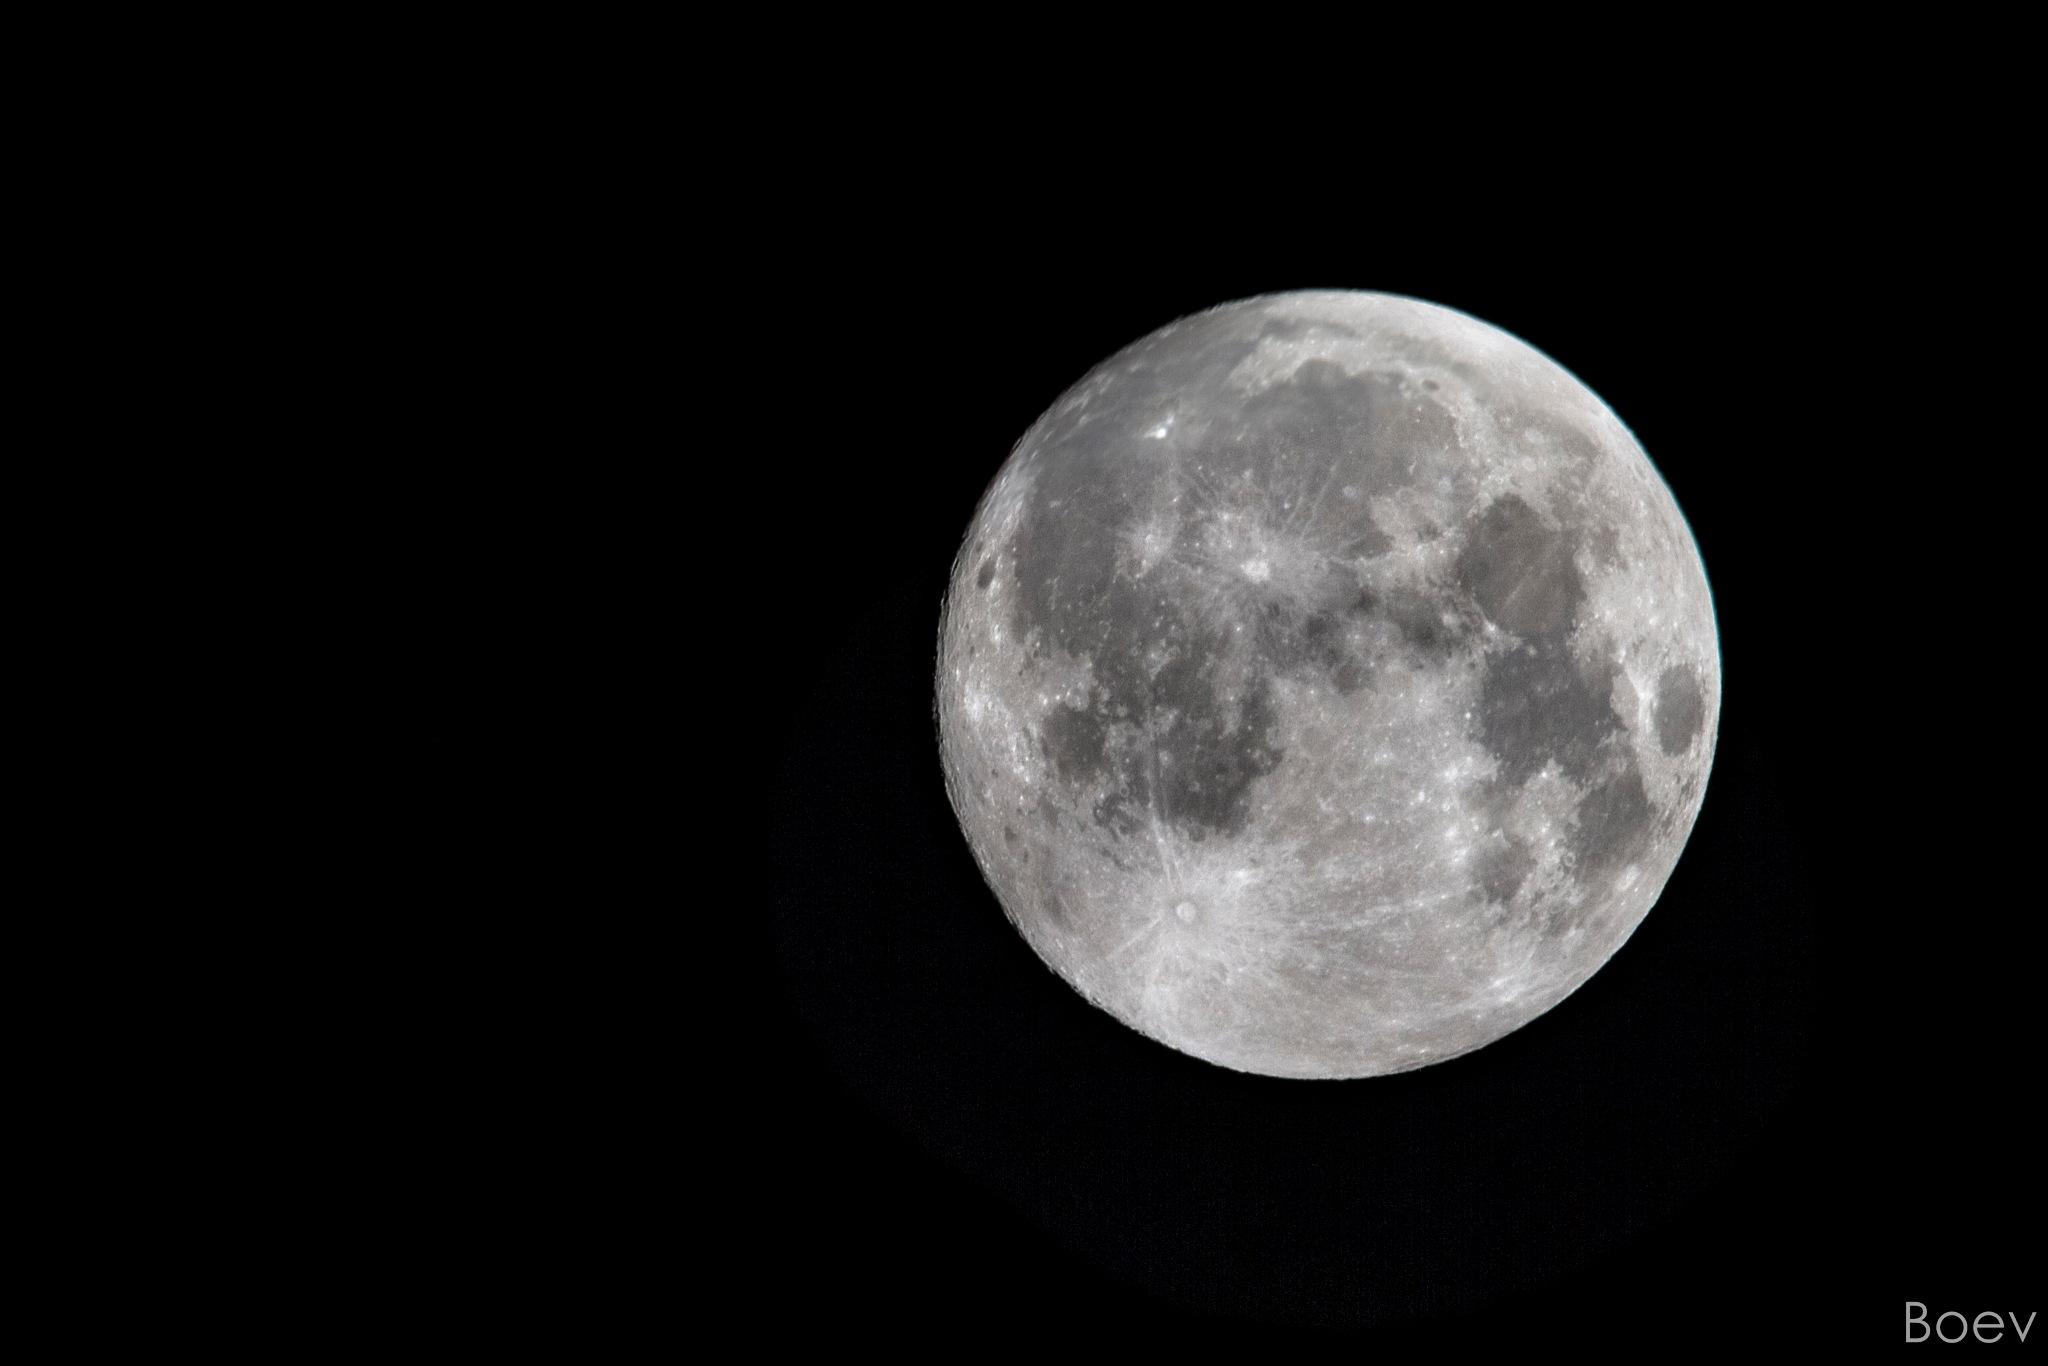 Full Moon by Gleb Boev